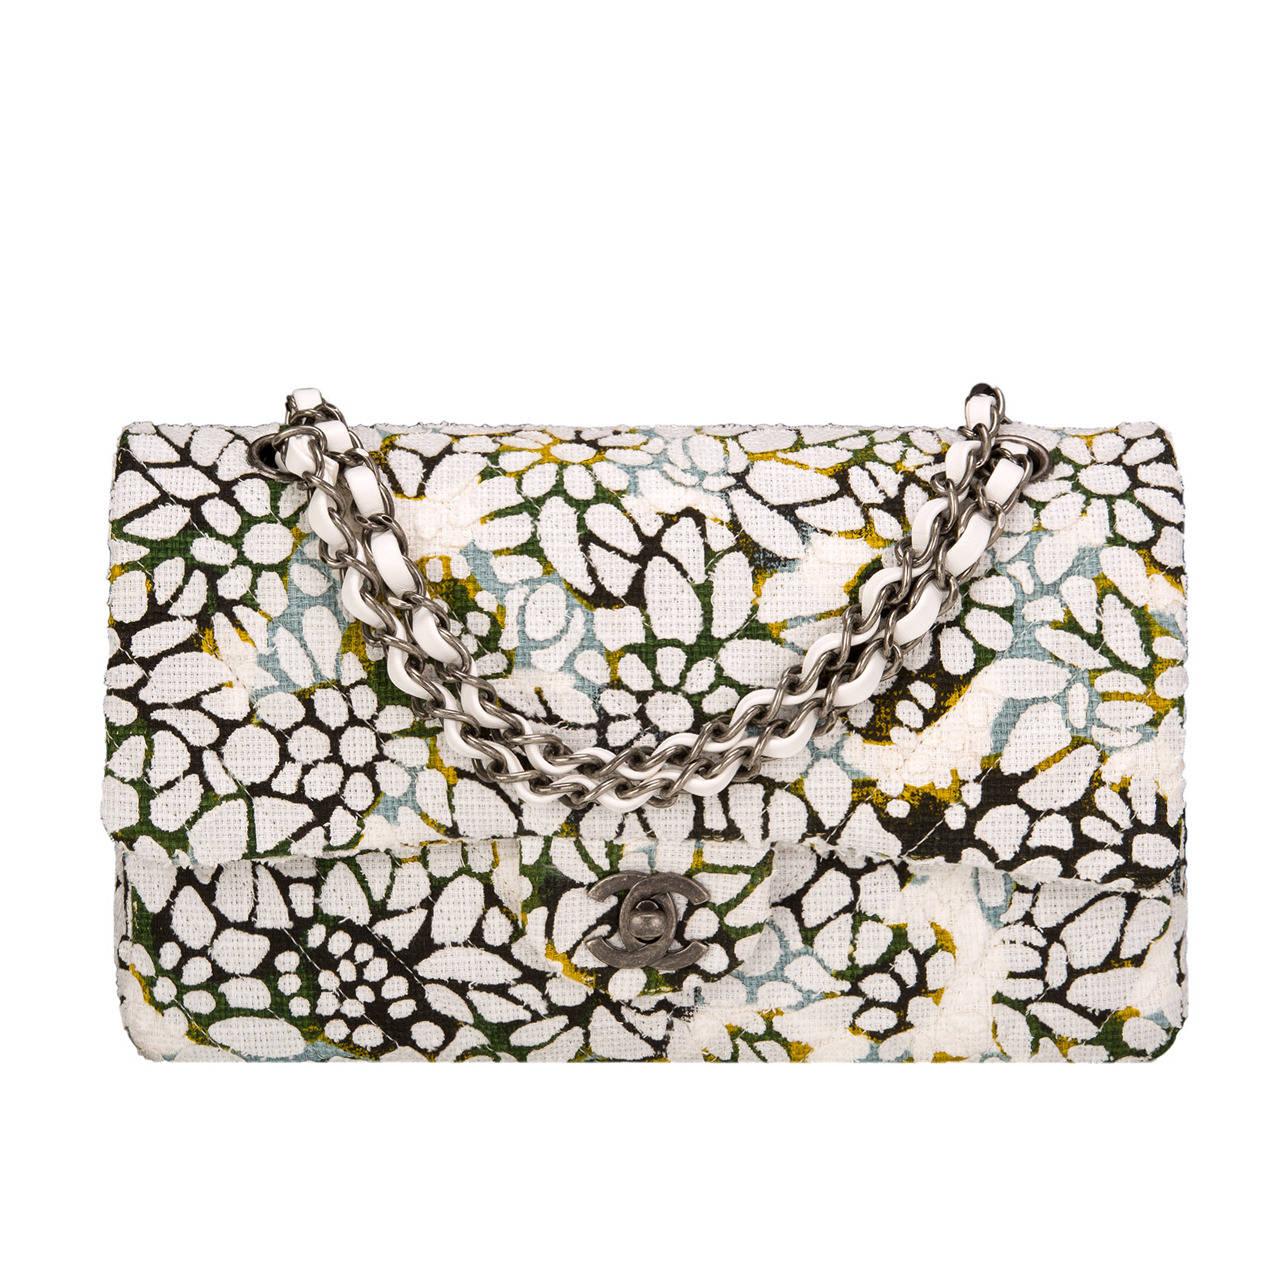 Chanel Floral Medium Classic Double Flap Bag For Sale